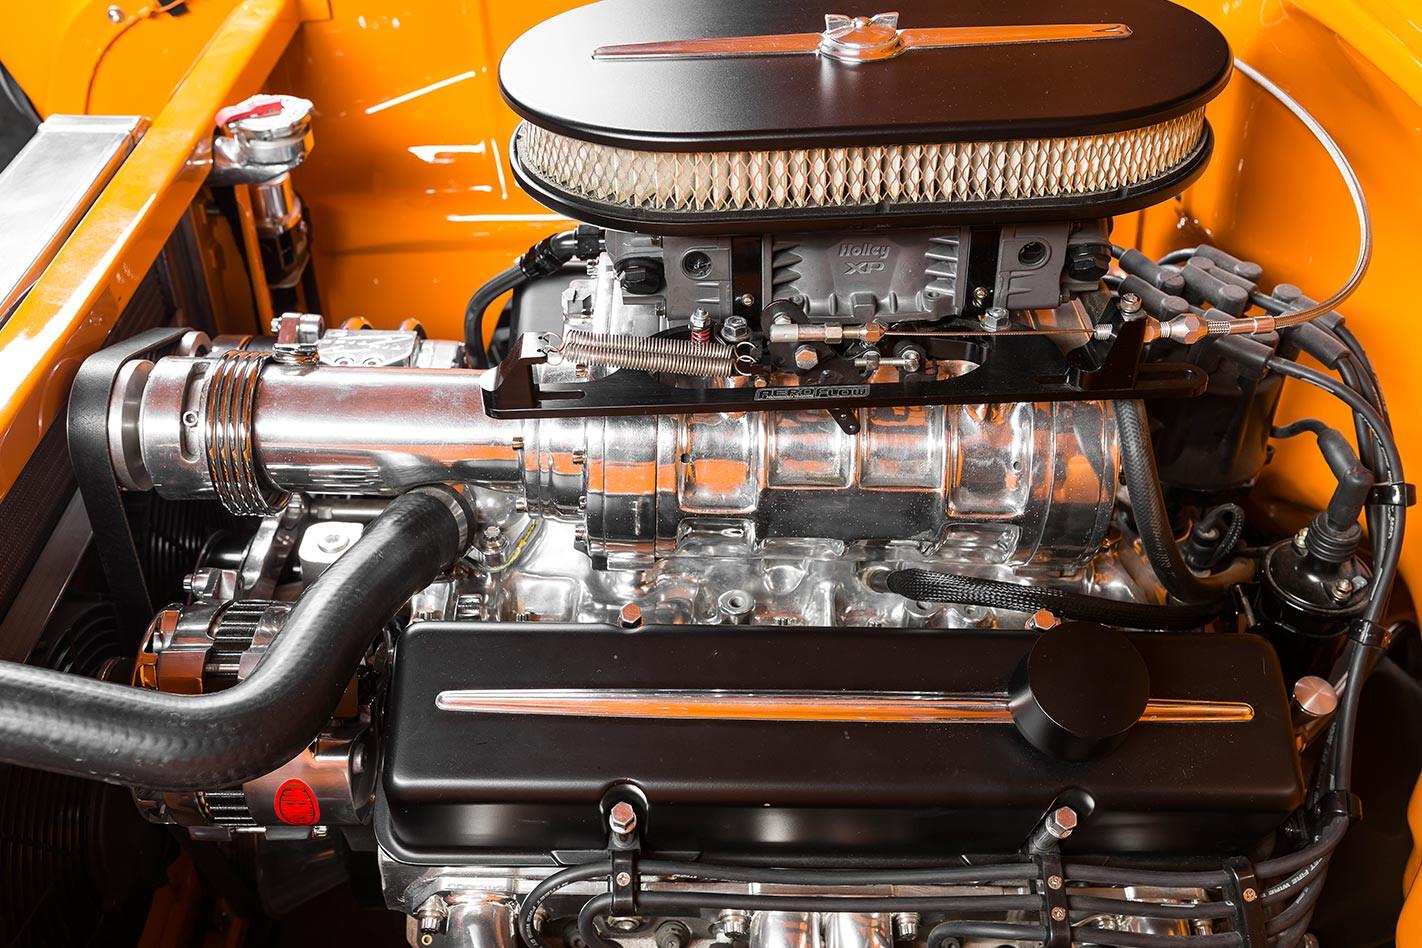 Chev Bel Air engine